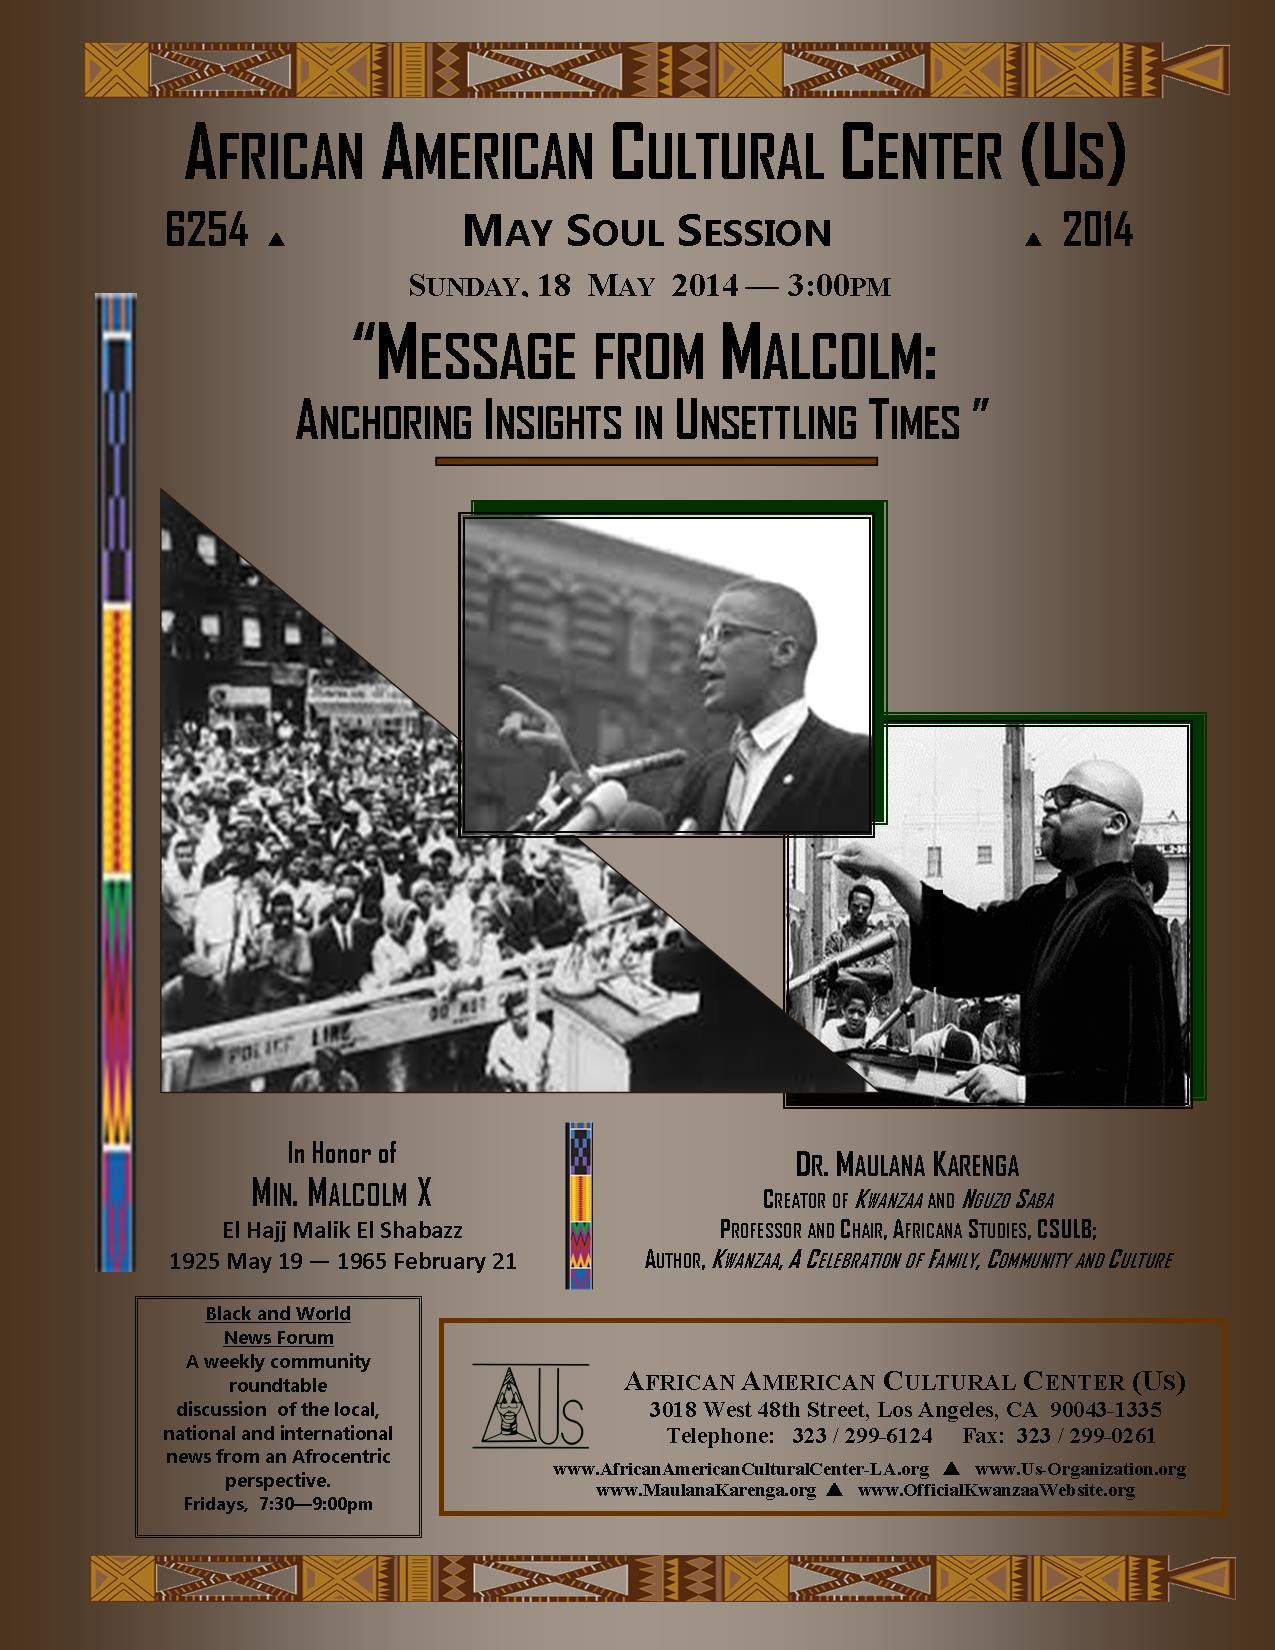 05-18-14 Dr. Maulana Karenga--MX